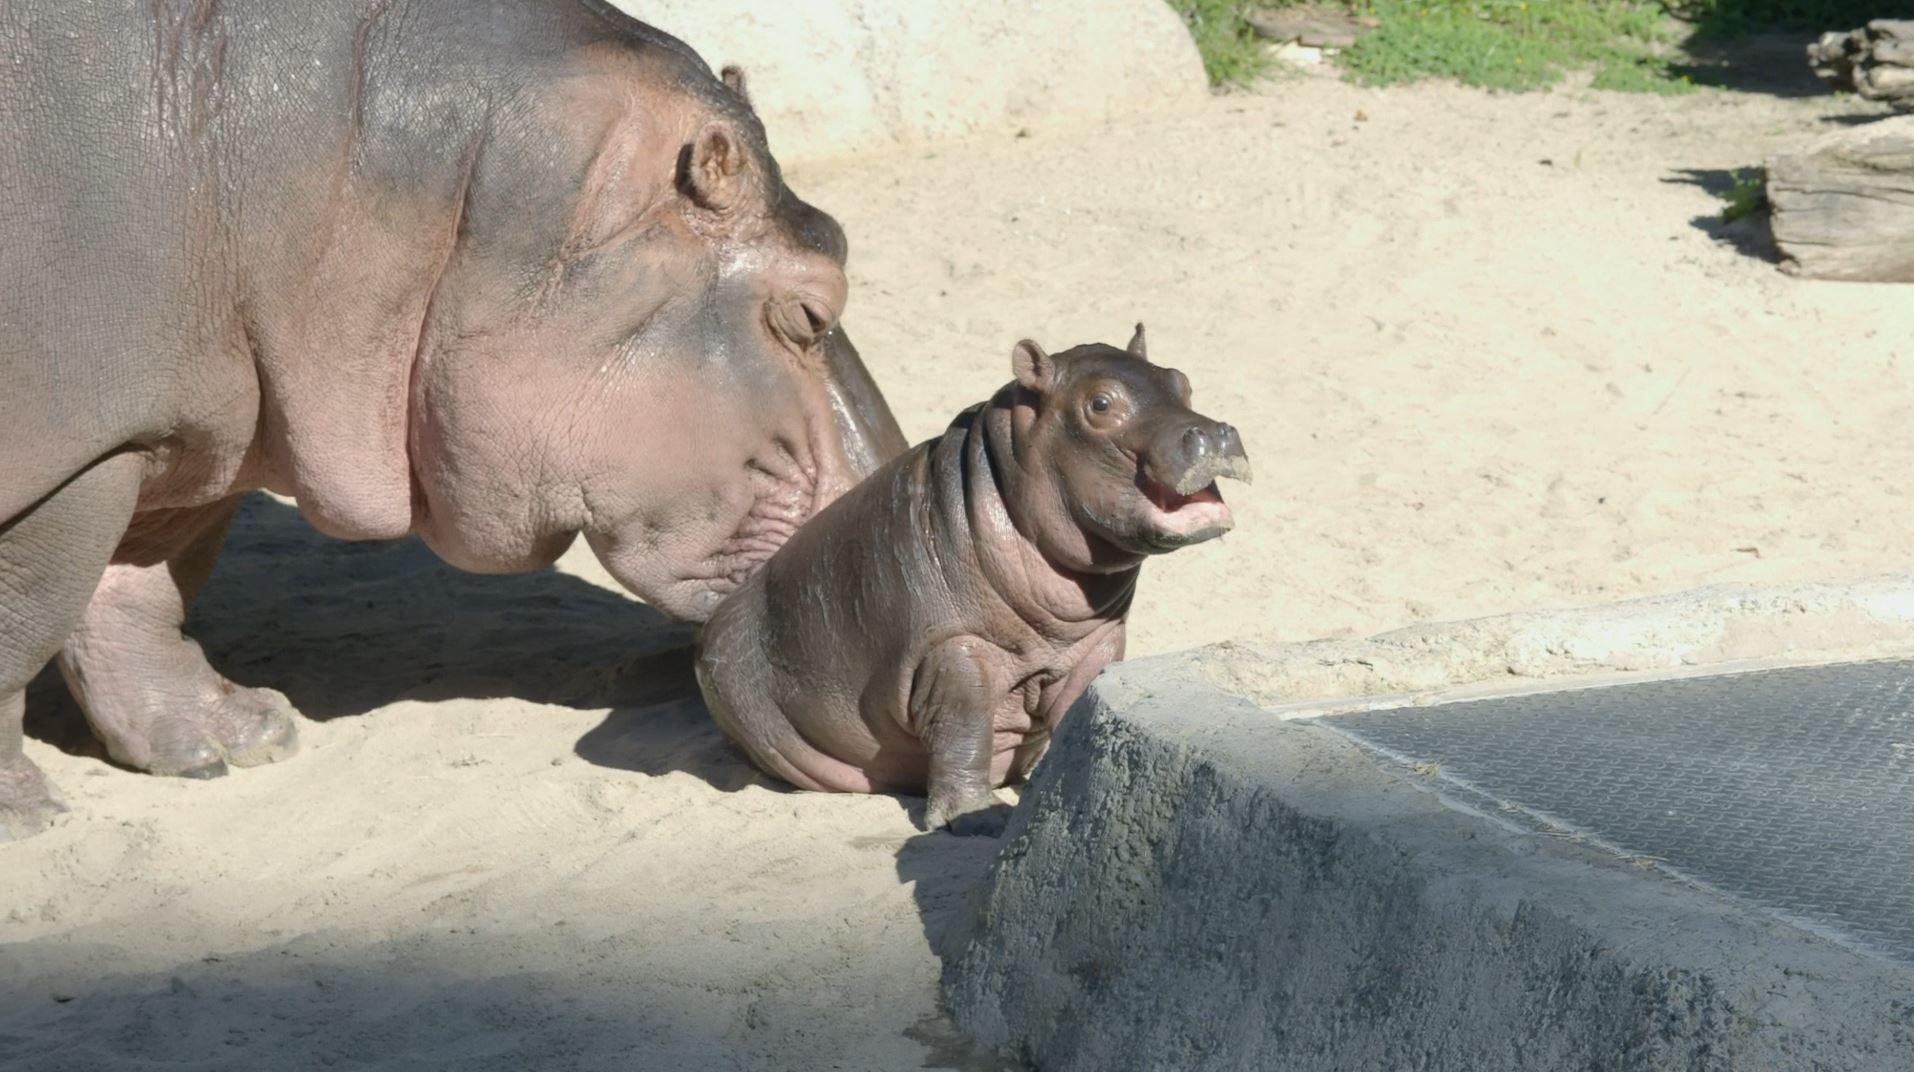 San Diego Zoo Christmas 2020 San Diego Zoo's baby hippo gets her name   FOX 5 San Diego